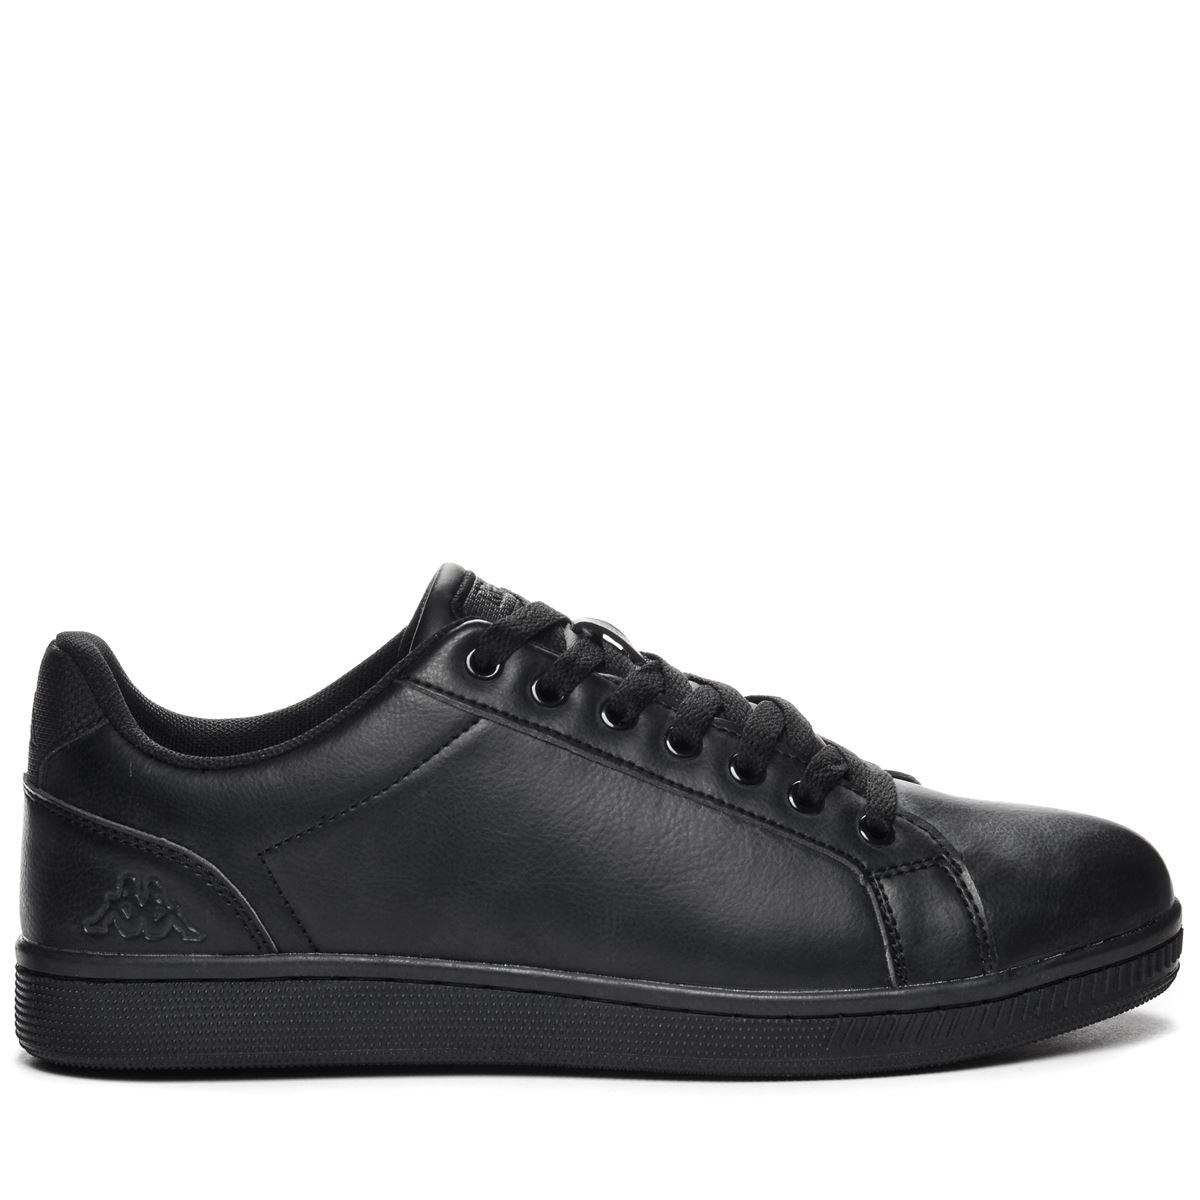 Kappa-Scarpe-Sneakers-Uomo-Donna-LOGO-GALTER-5-Camminata-Basso miniatuur 8